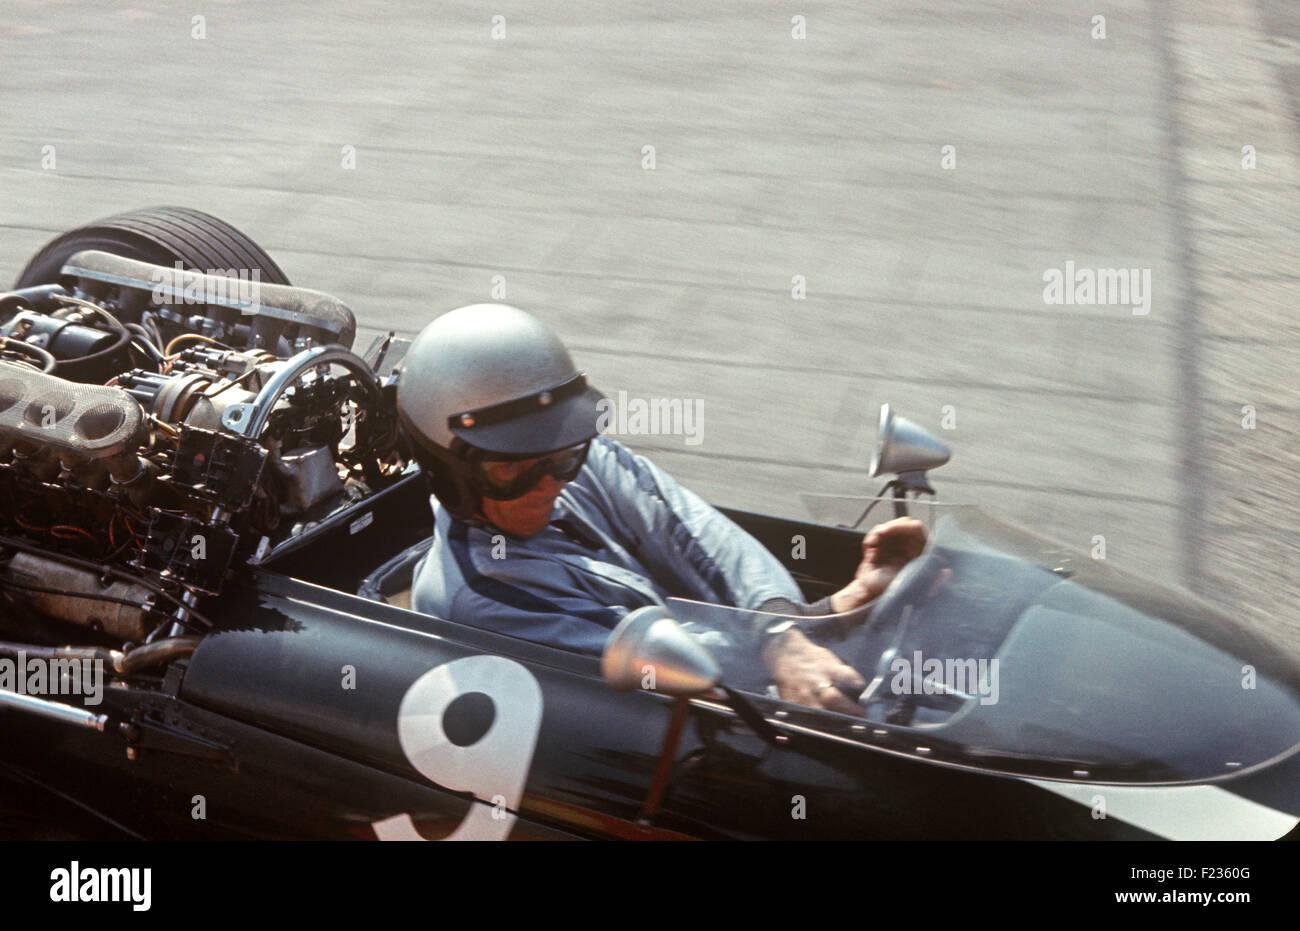 Richie ginther in cooper maserati no 9 monaco gp 22 may 1966 stock